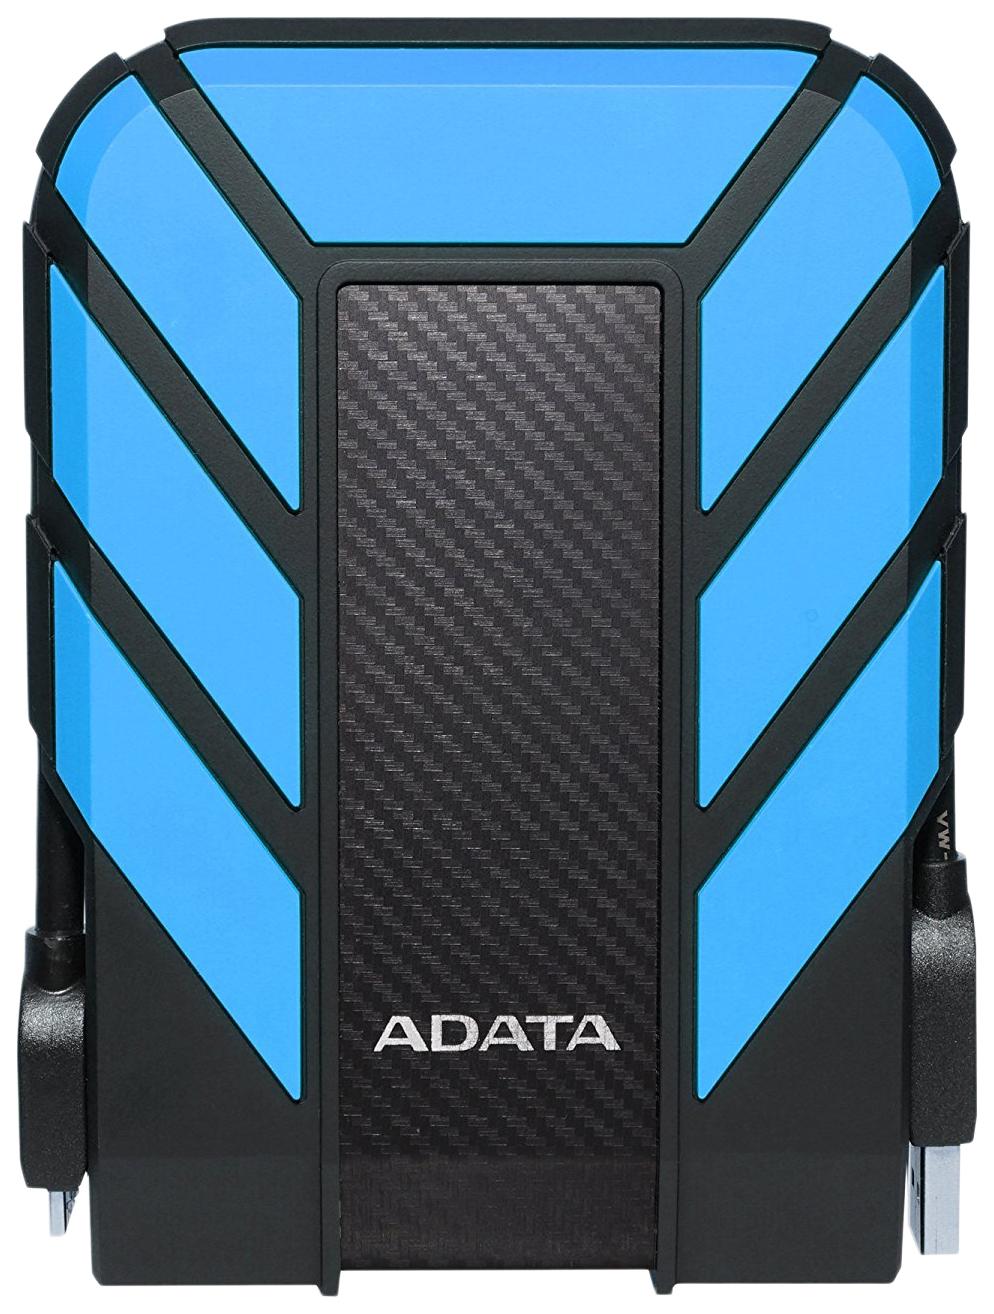 Внешний диск HDD ADATA 1TB Blue/Black (AHD710P